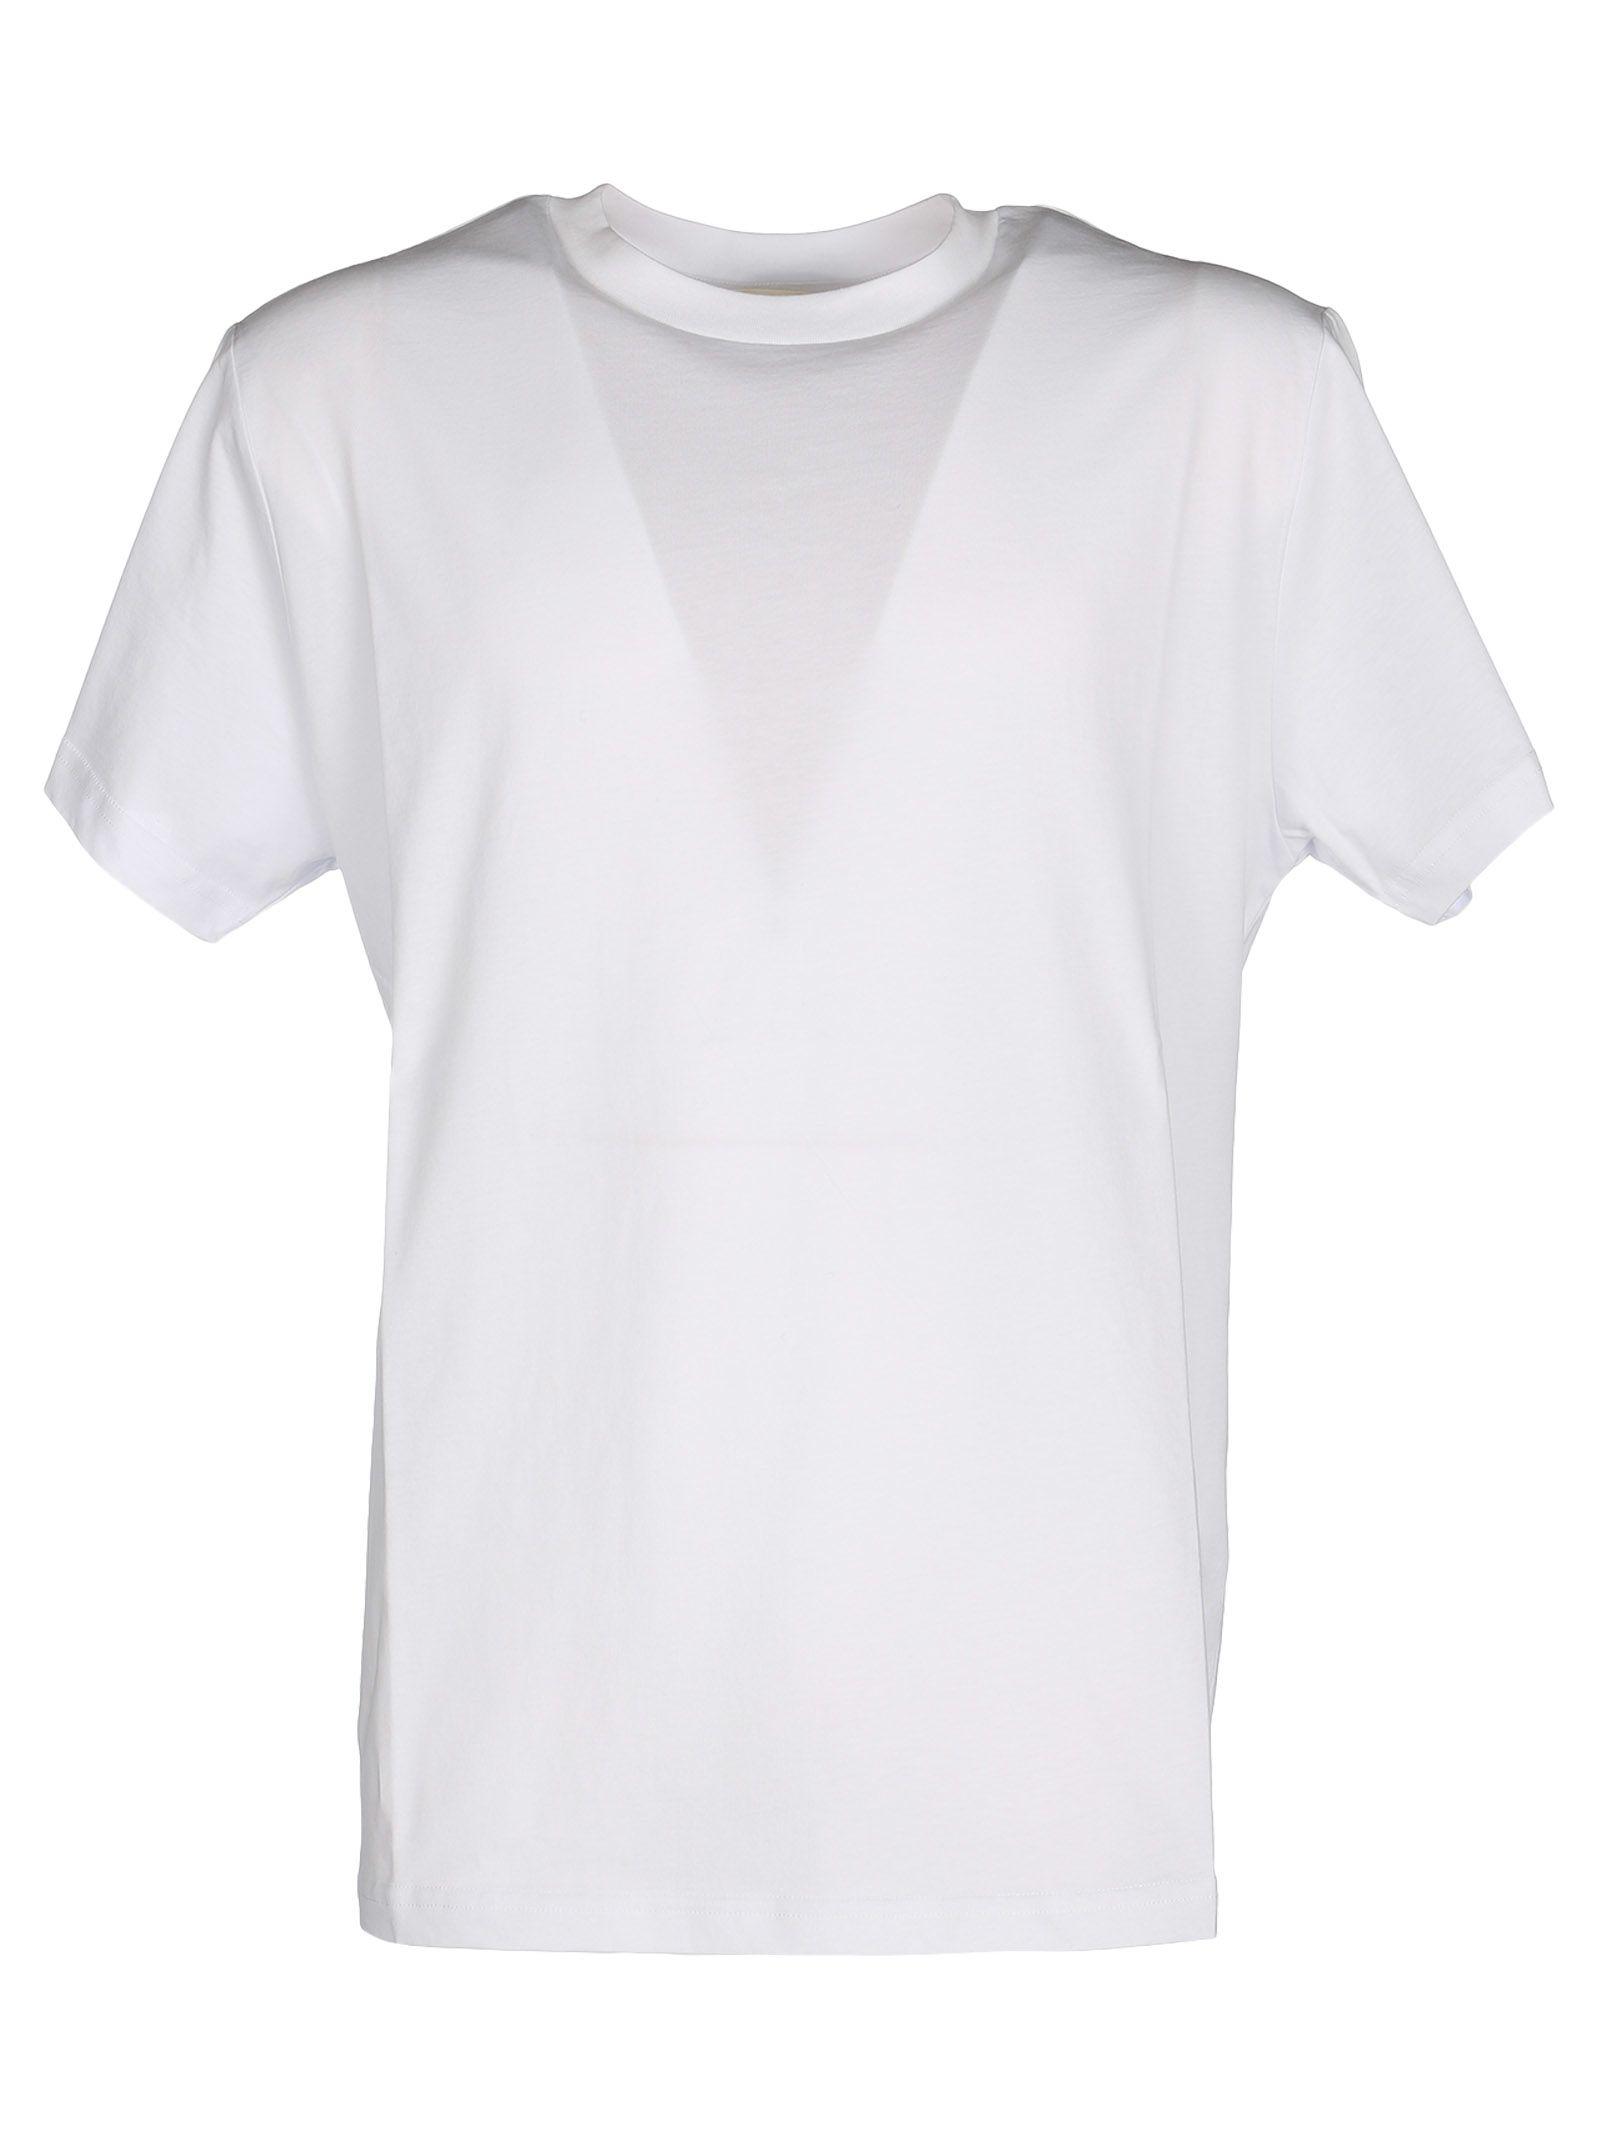 Alyx halcyon Blvd T-shirt